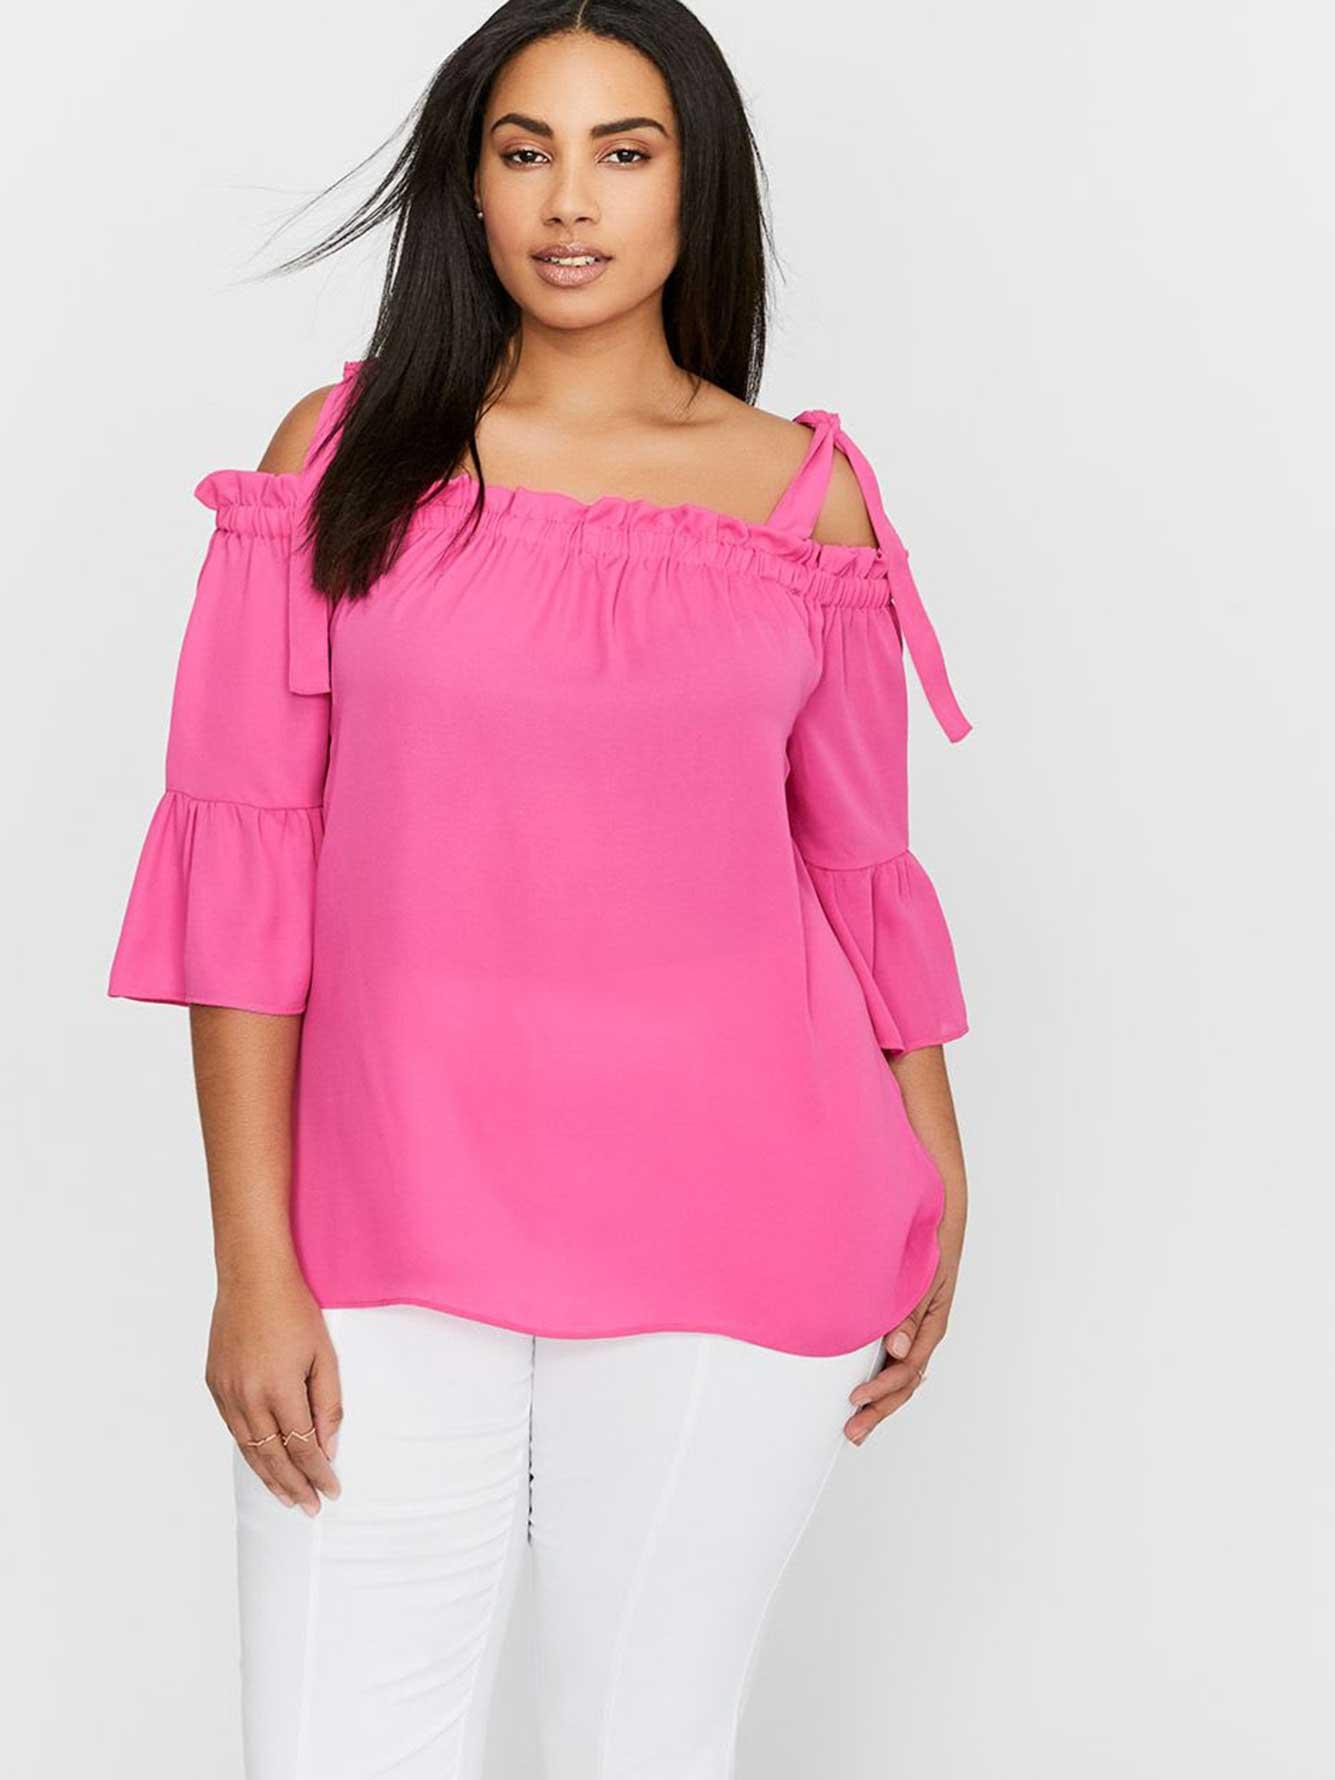 Plus size tasteful sexy blouse